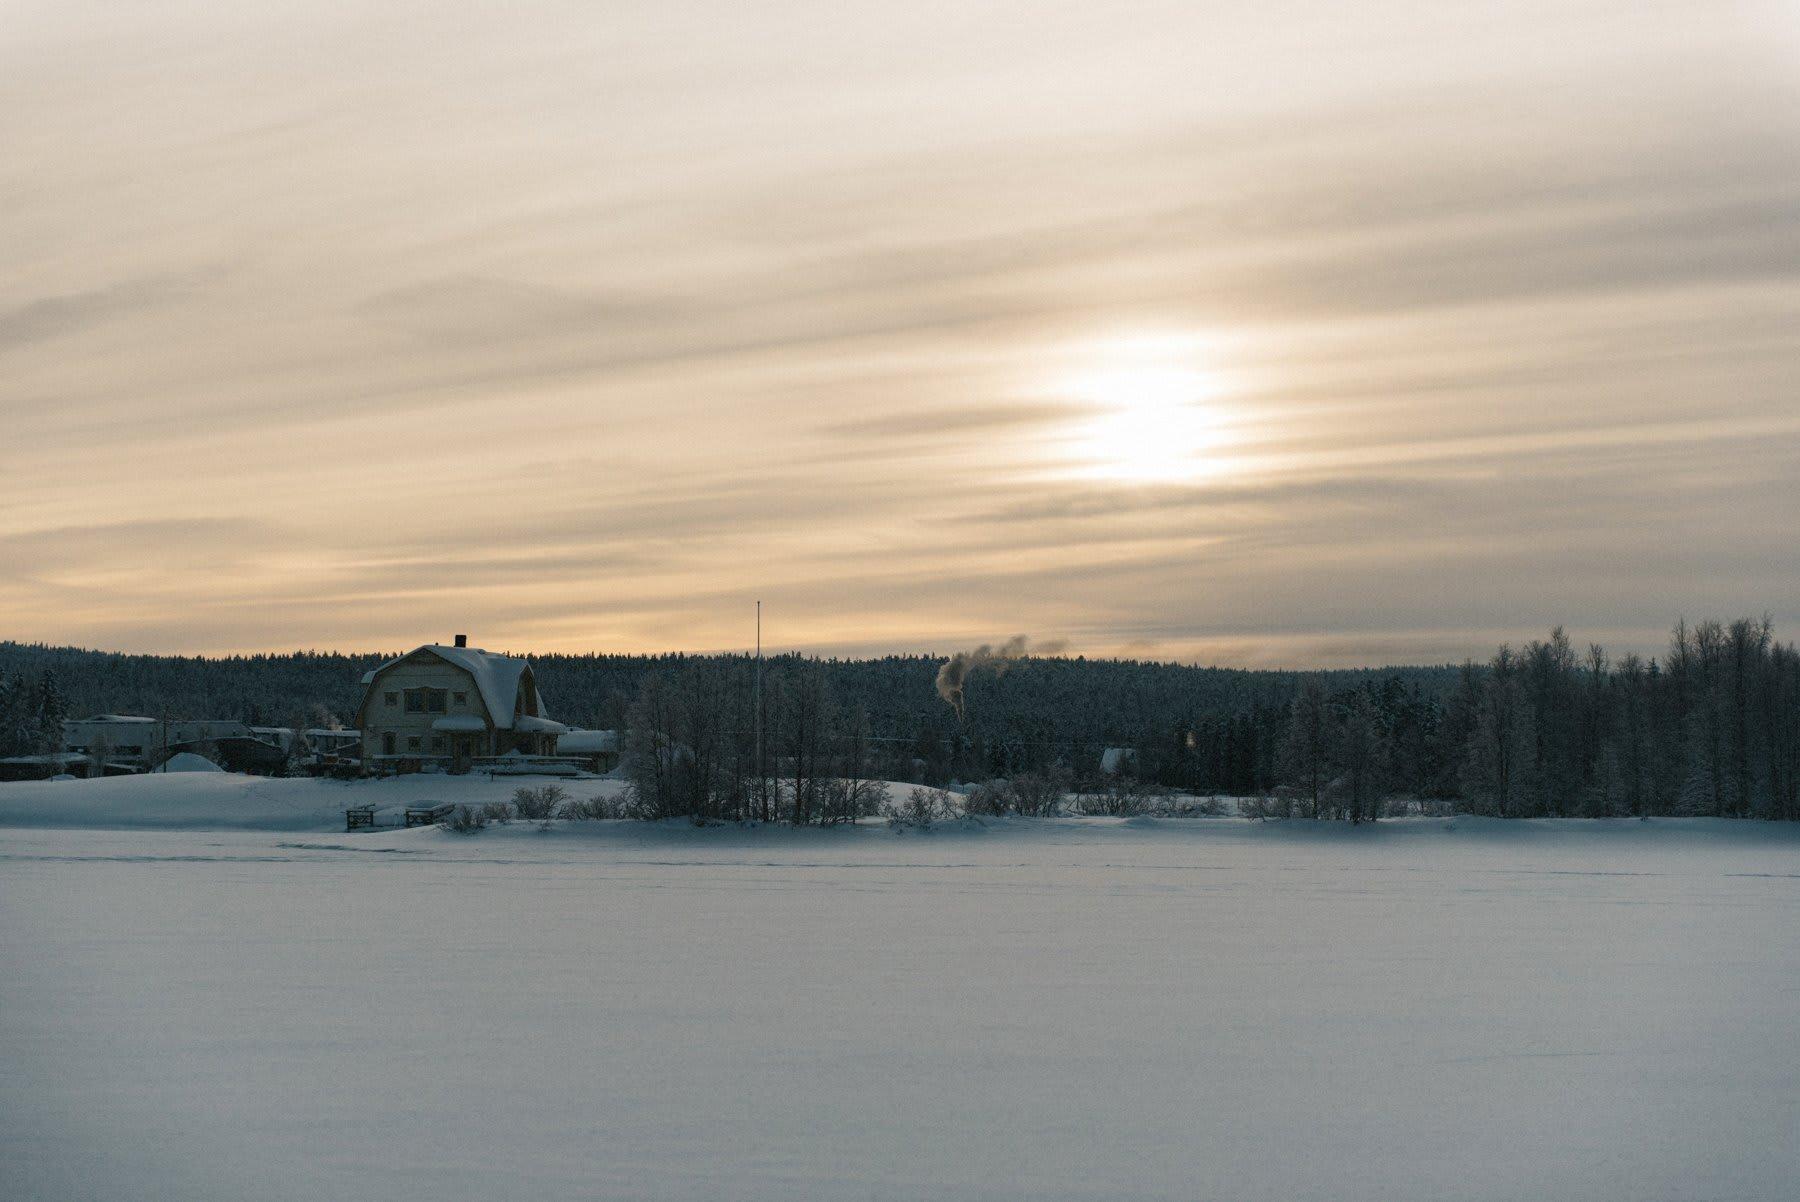 reisefotografie-lappland-finnland-118